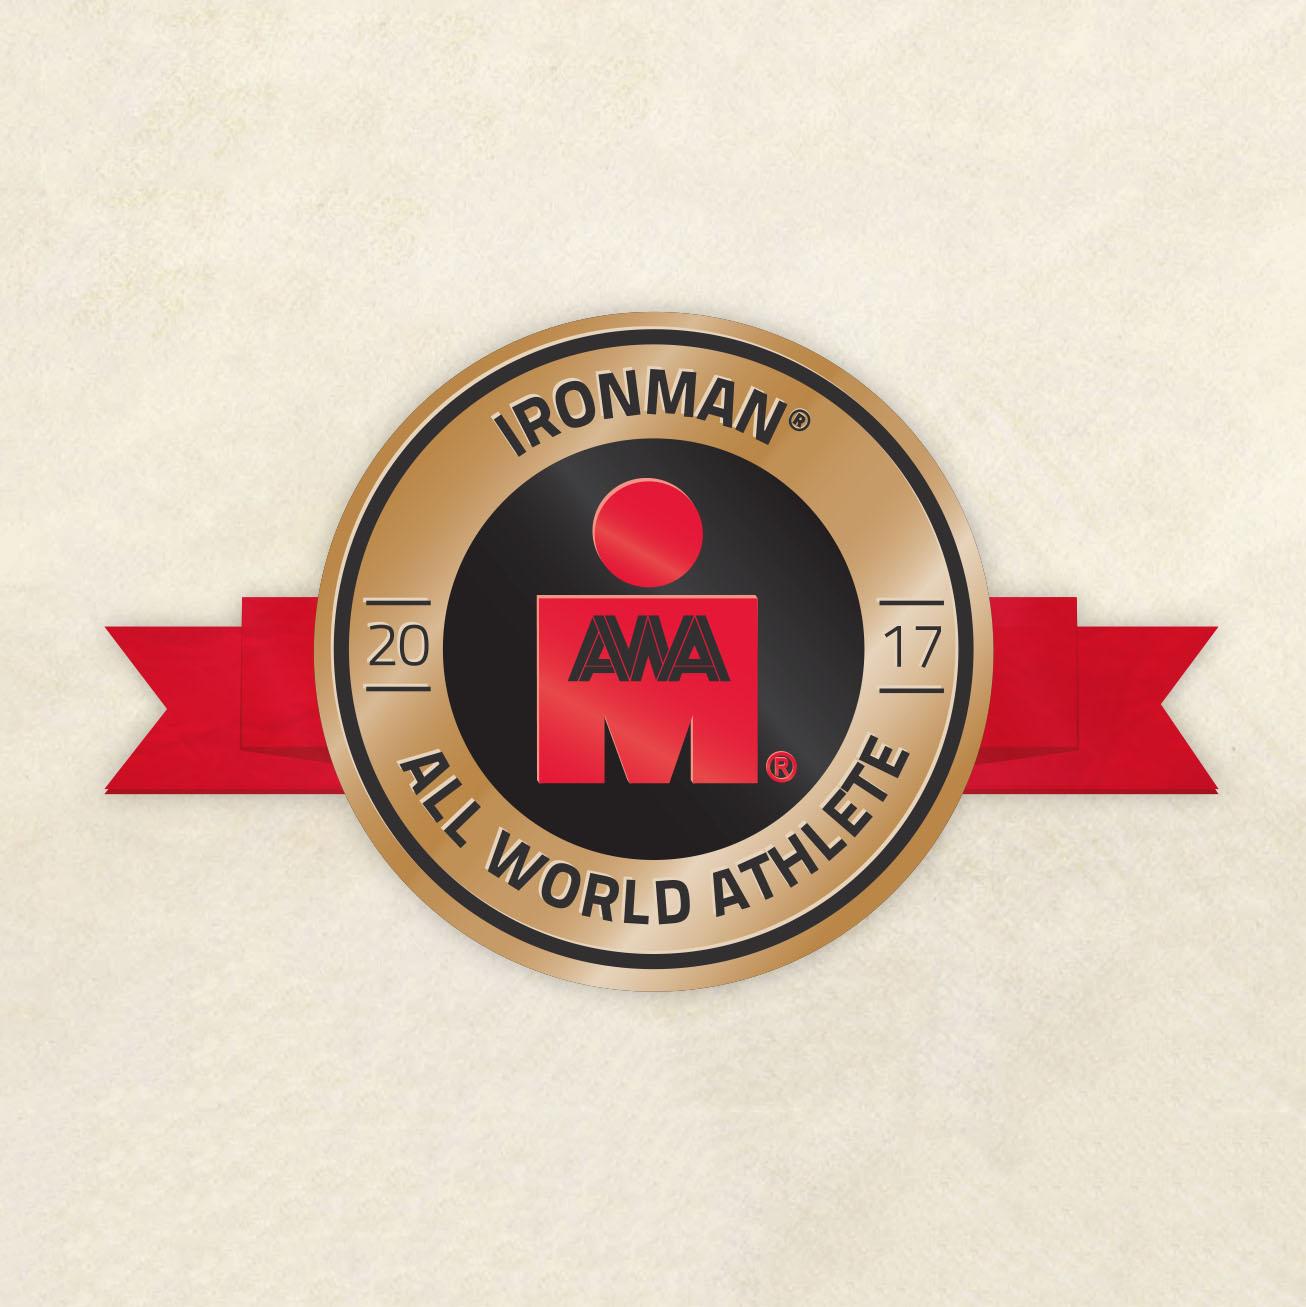 Ironman All World Athlete :)